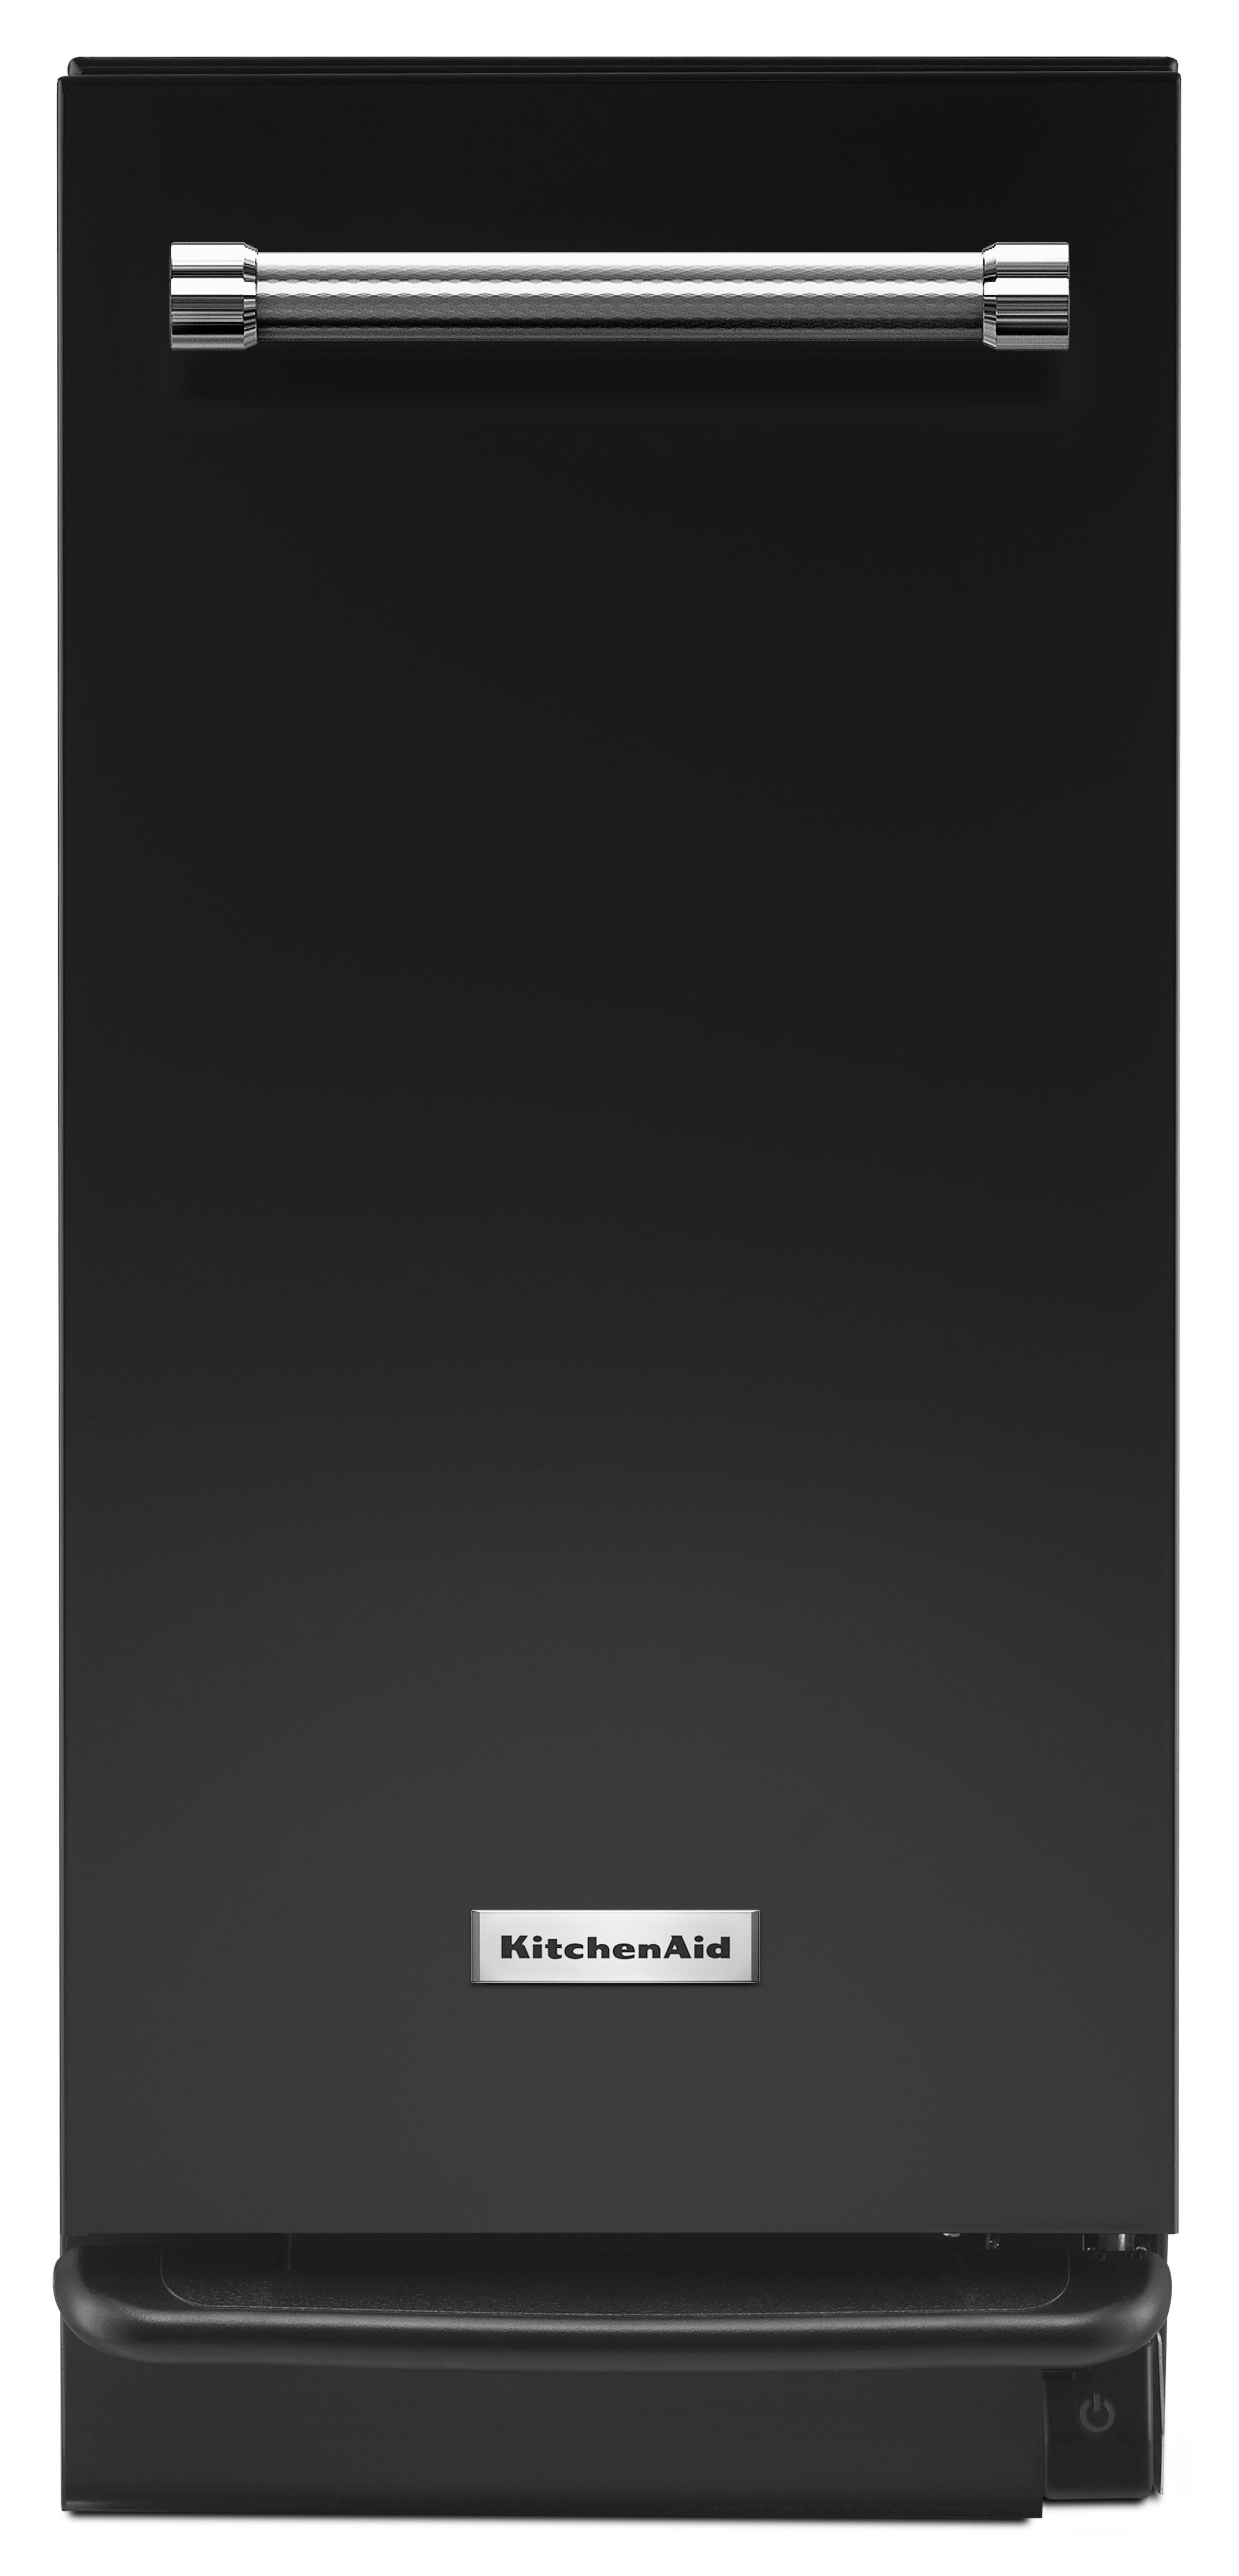 kitchenaid 15 built in trash compactor black ktts505ebl home rh leonardiappliance com